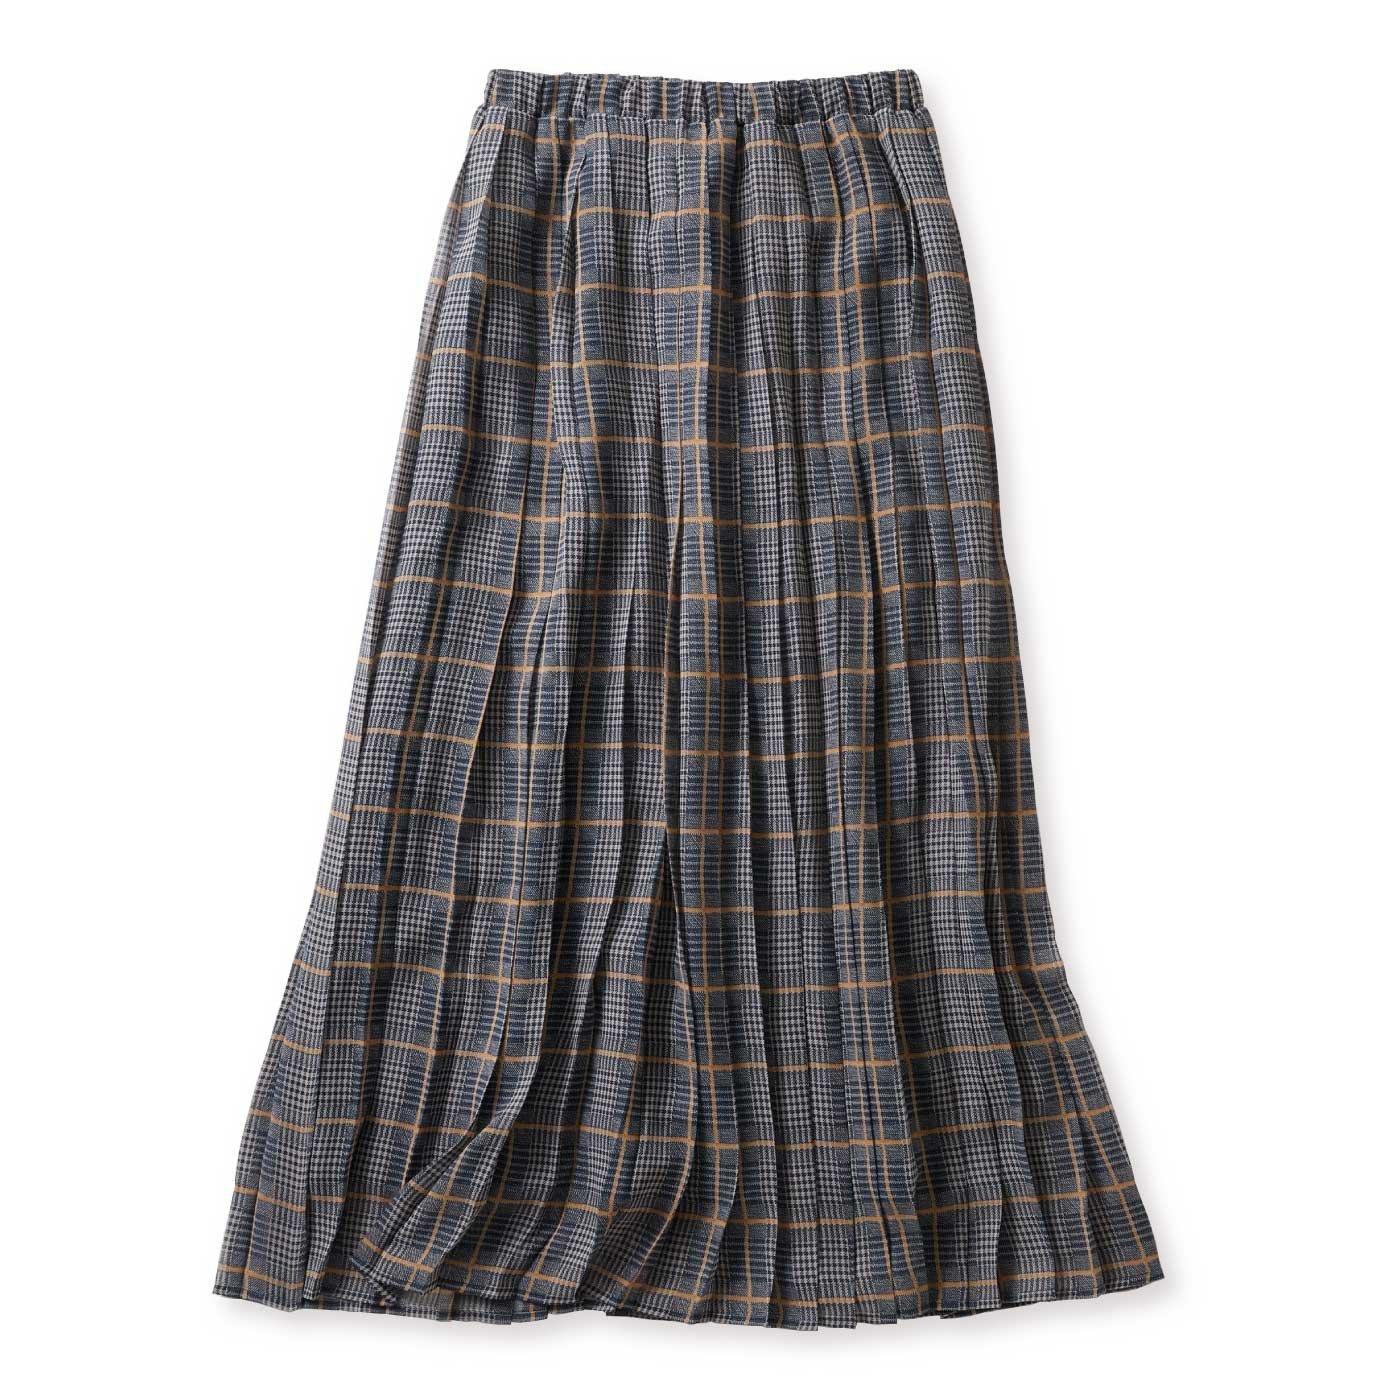 IEDIT[イディット] シフォンが軽やかなチェック柄プリーツマキシスカート〈グレー〉